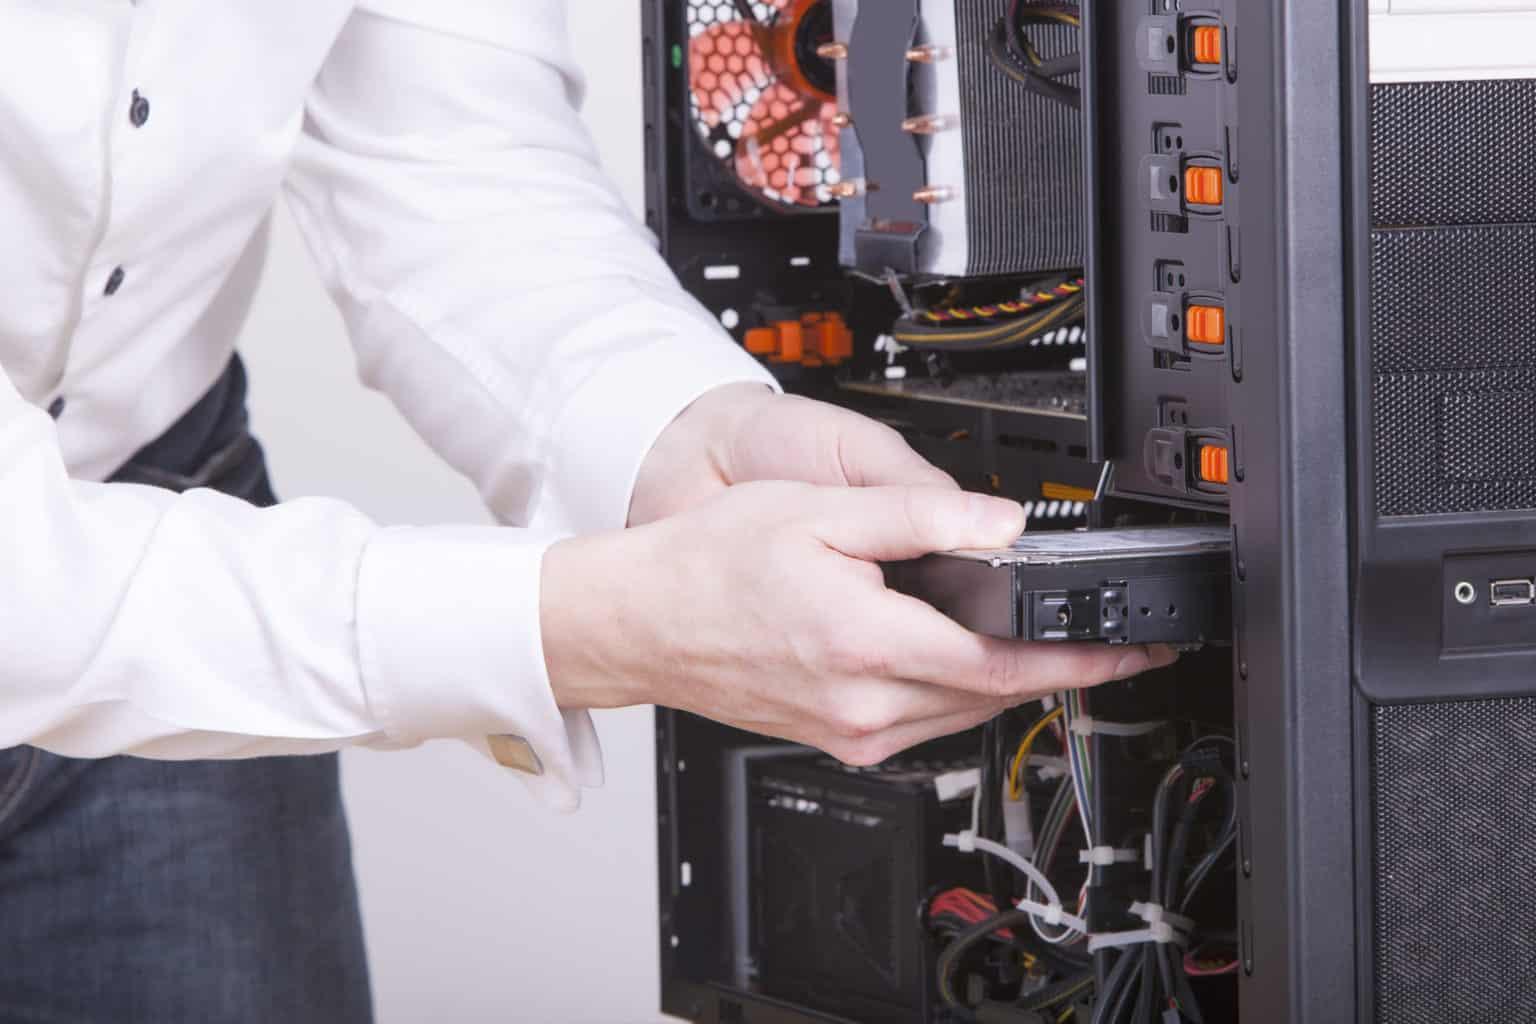 Decommissioning Data Centres